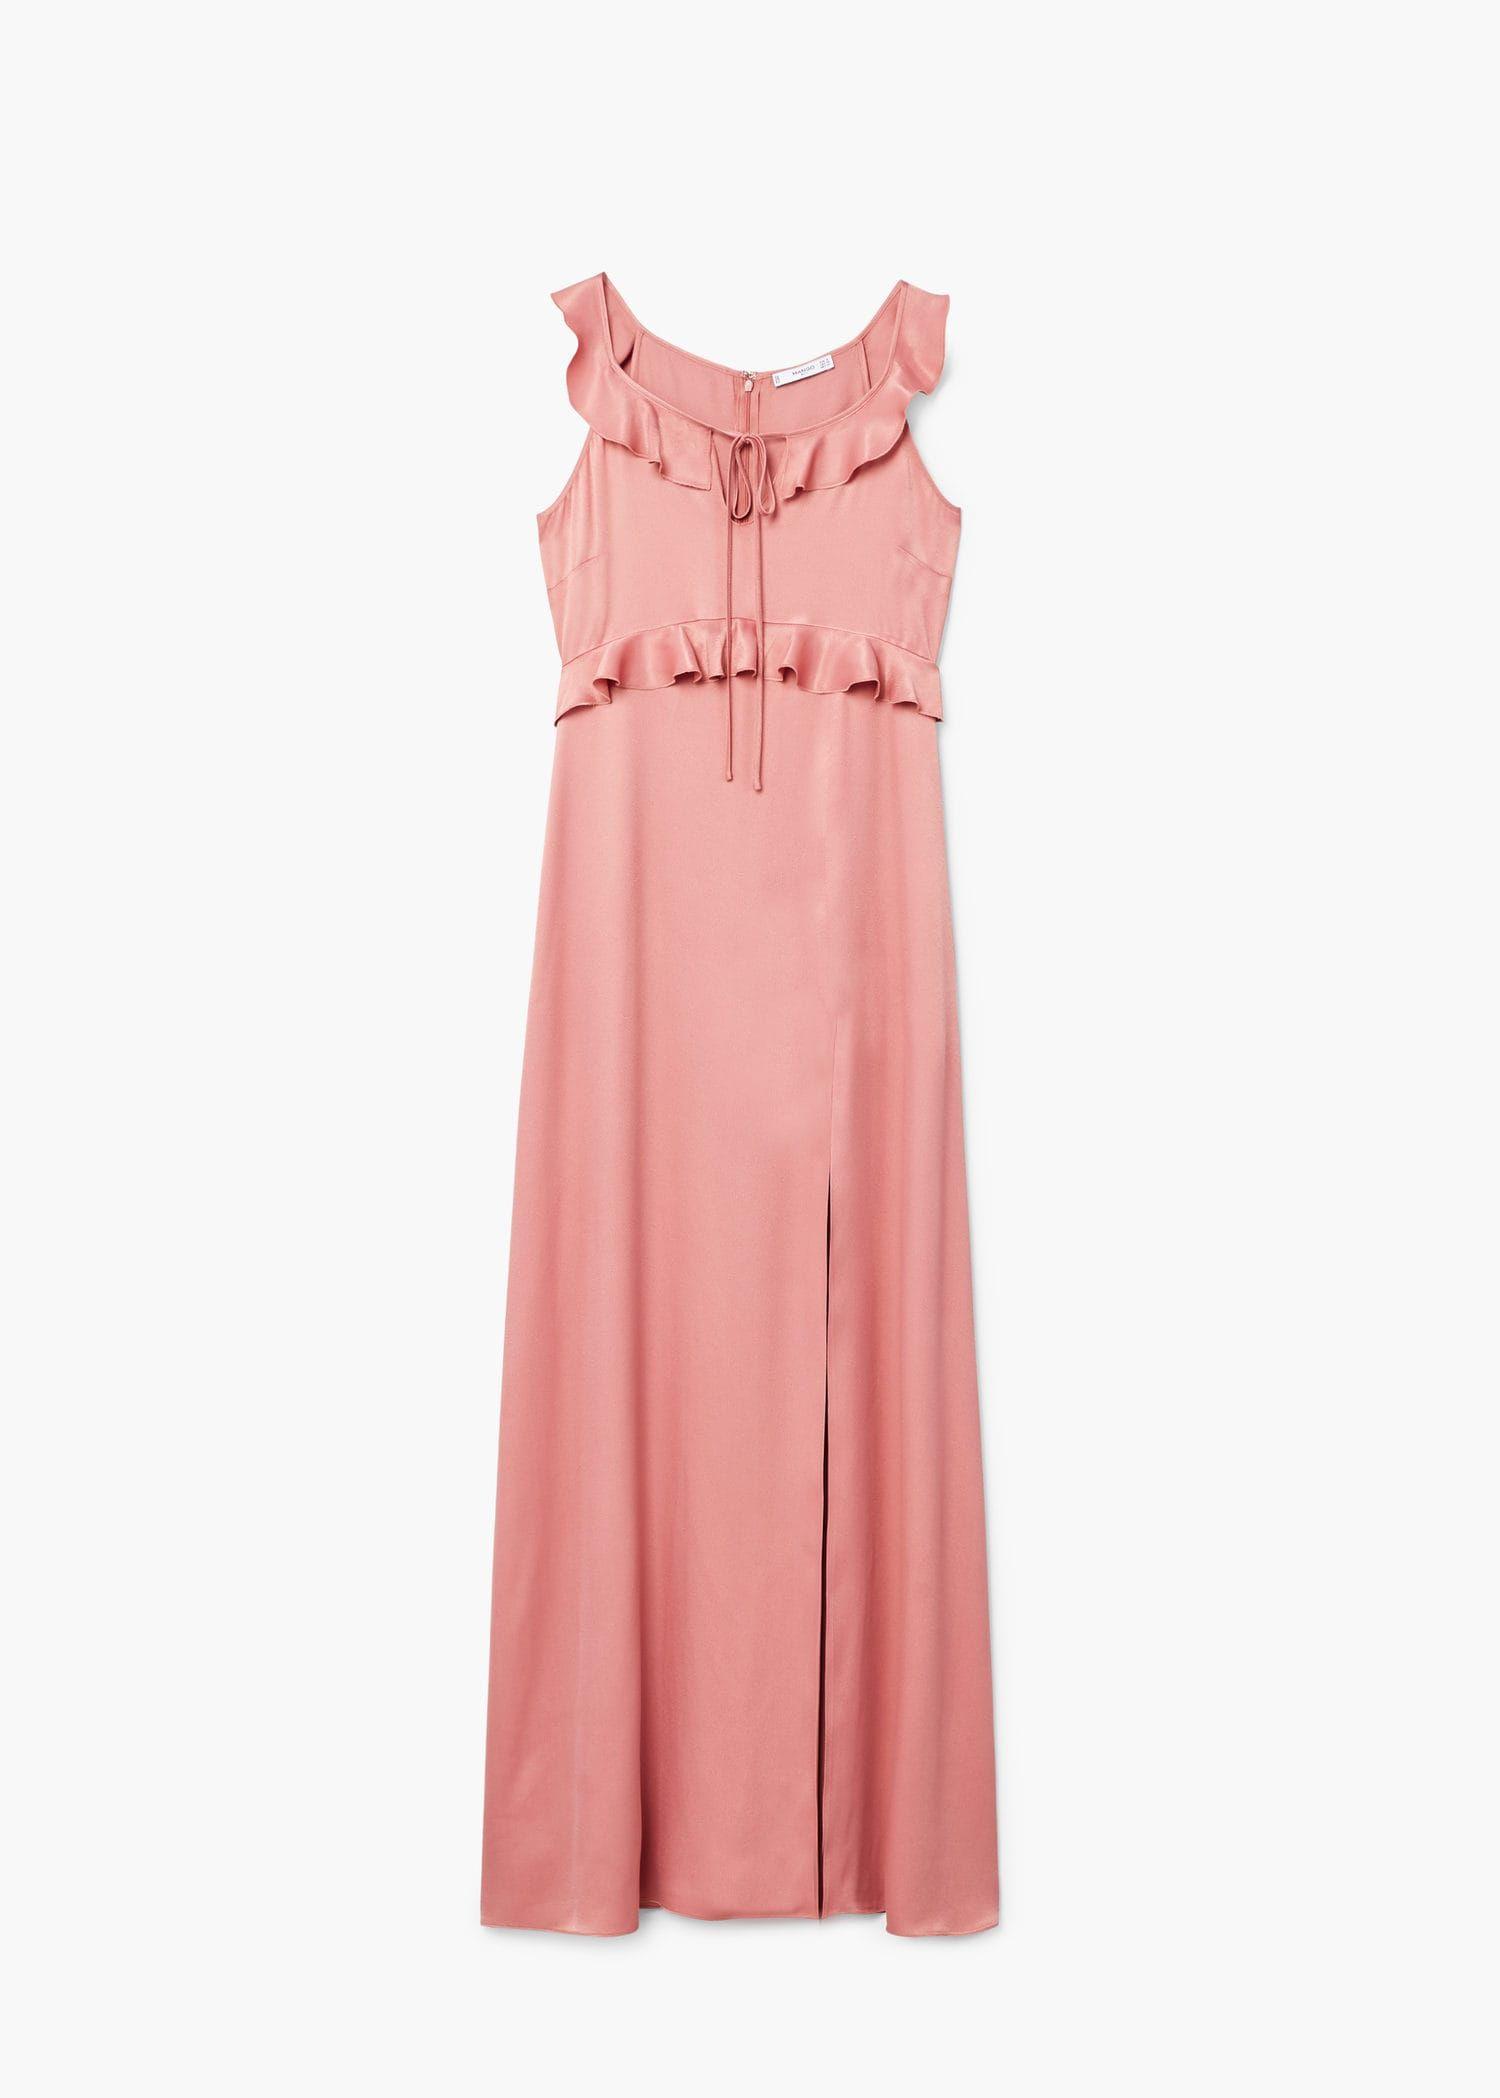 Encantador Vestidos Largos De Menos De 100 Ideas Ornamento ...